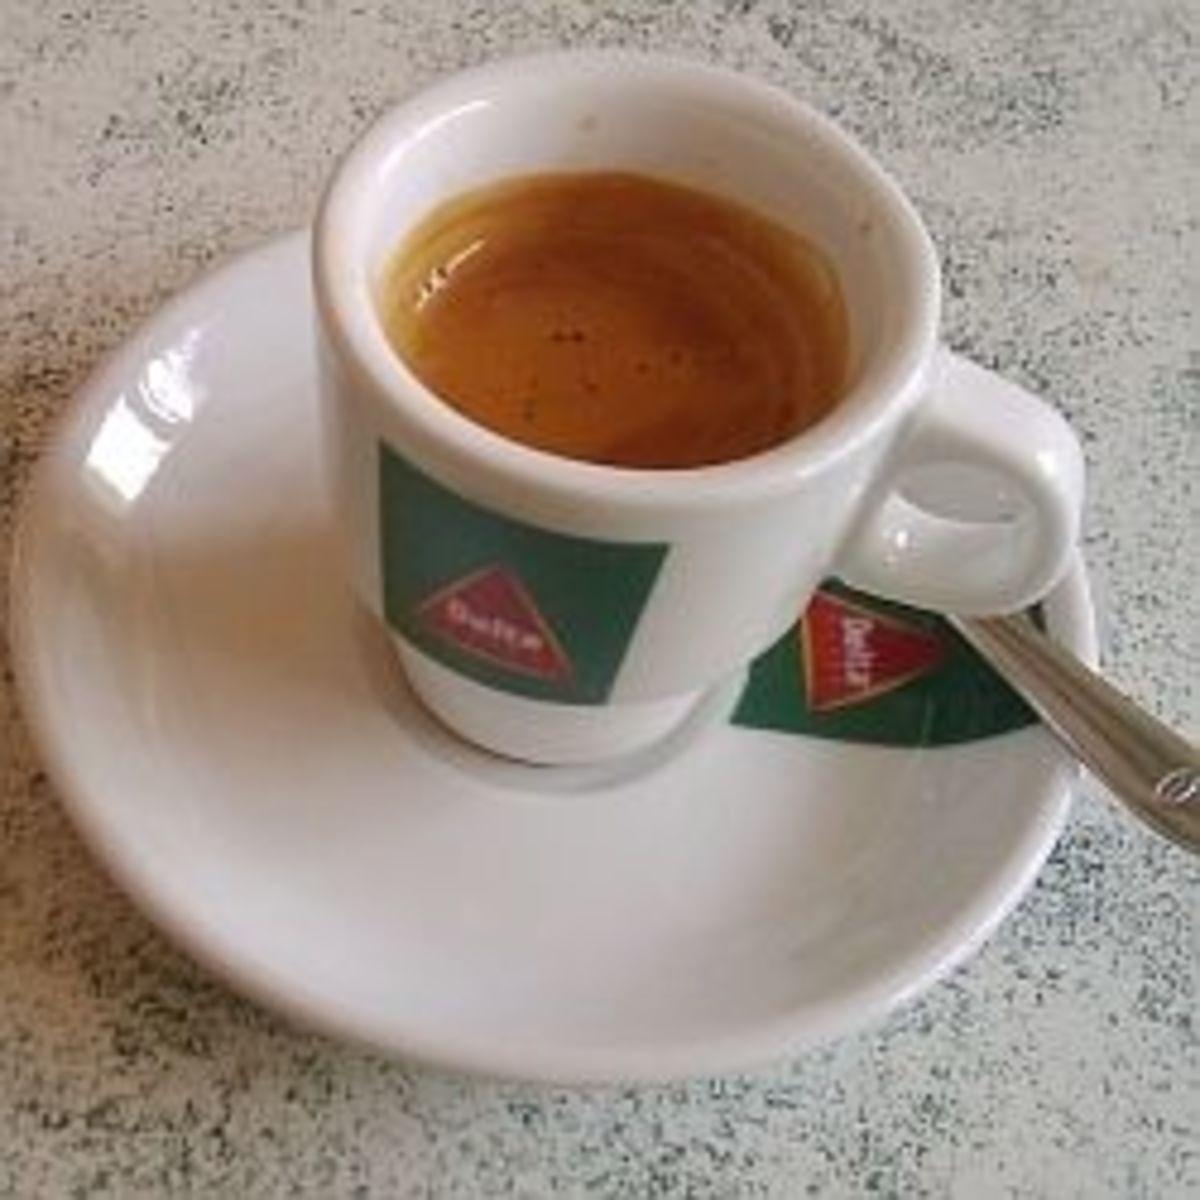 espresso-versus-turkish-coffee-versus-drip-coffee